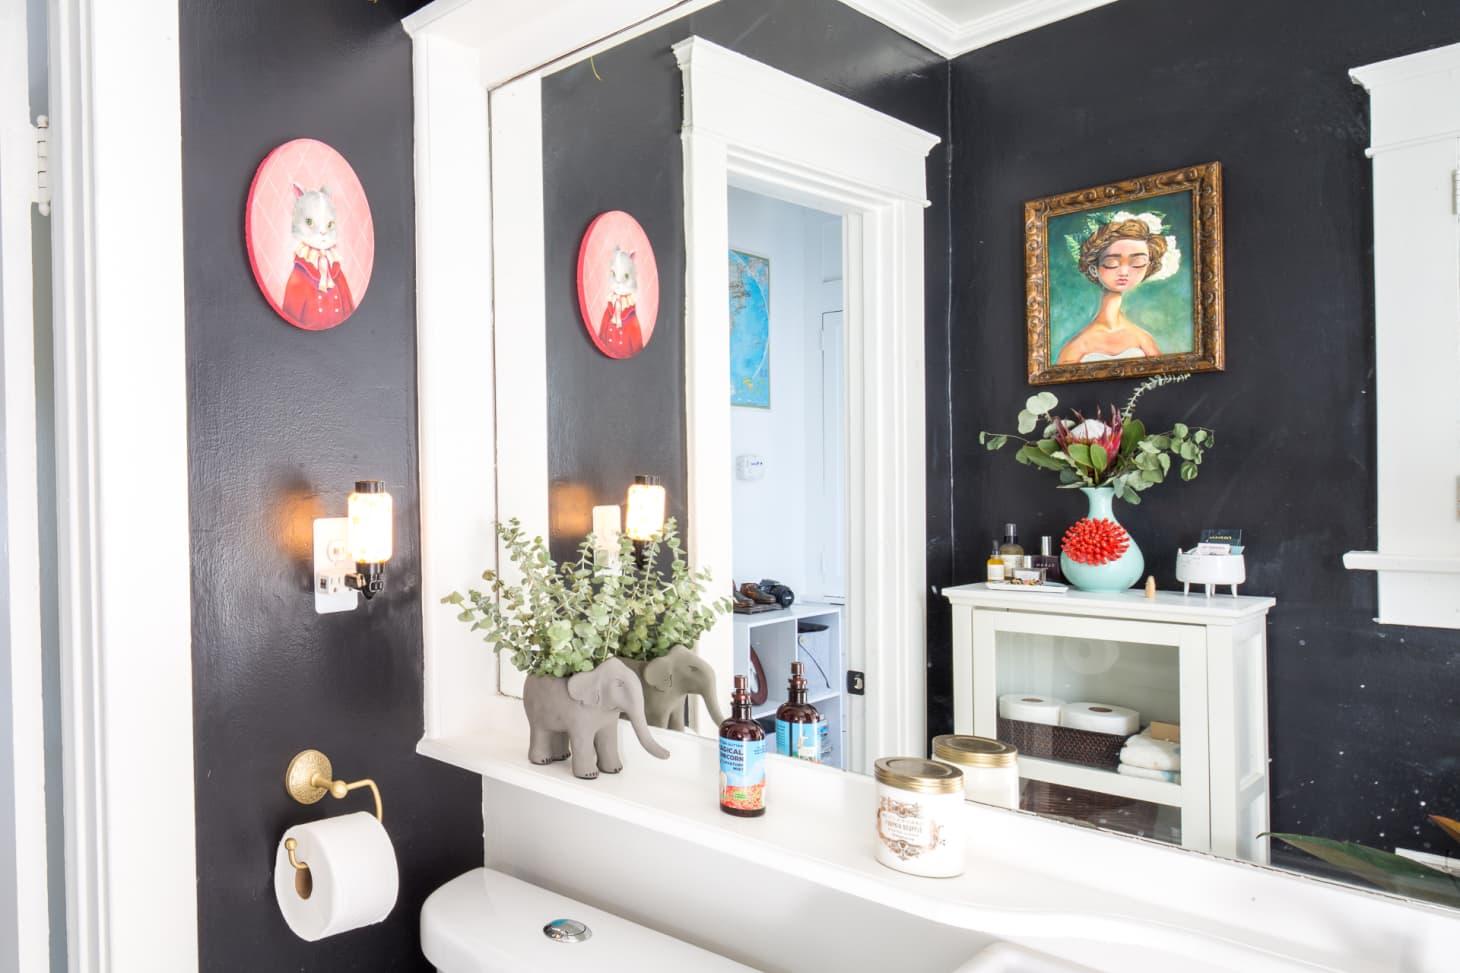 25 Small Bathroom Storage & Design Ideas - Storage ... on Small Apartment Bathroom Storage Ideas  id=26970